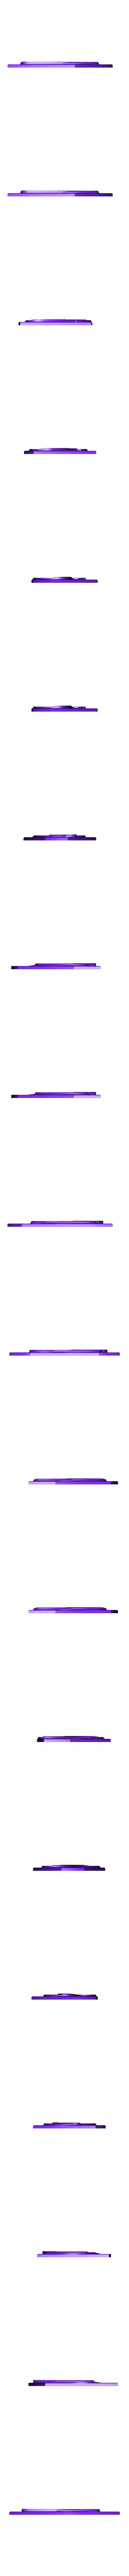 Assem1Slogo1_fixed.stl Download free STL file Man of Steel logo (Dual Extrusion) • 3D printing design, Yipham